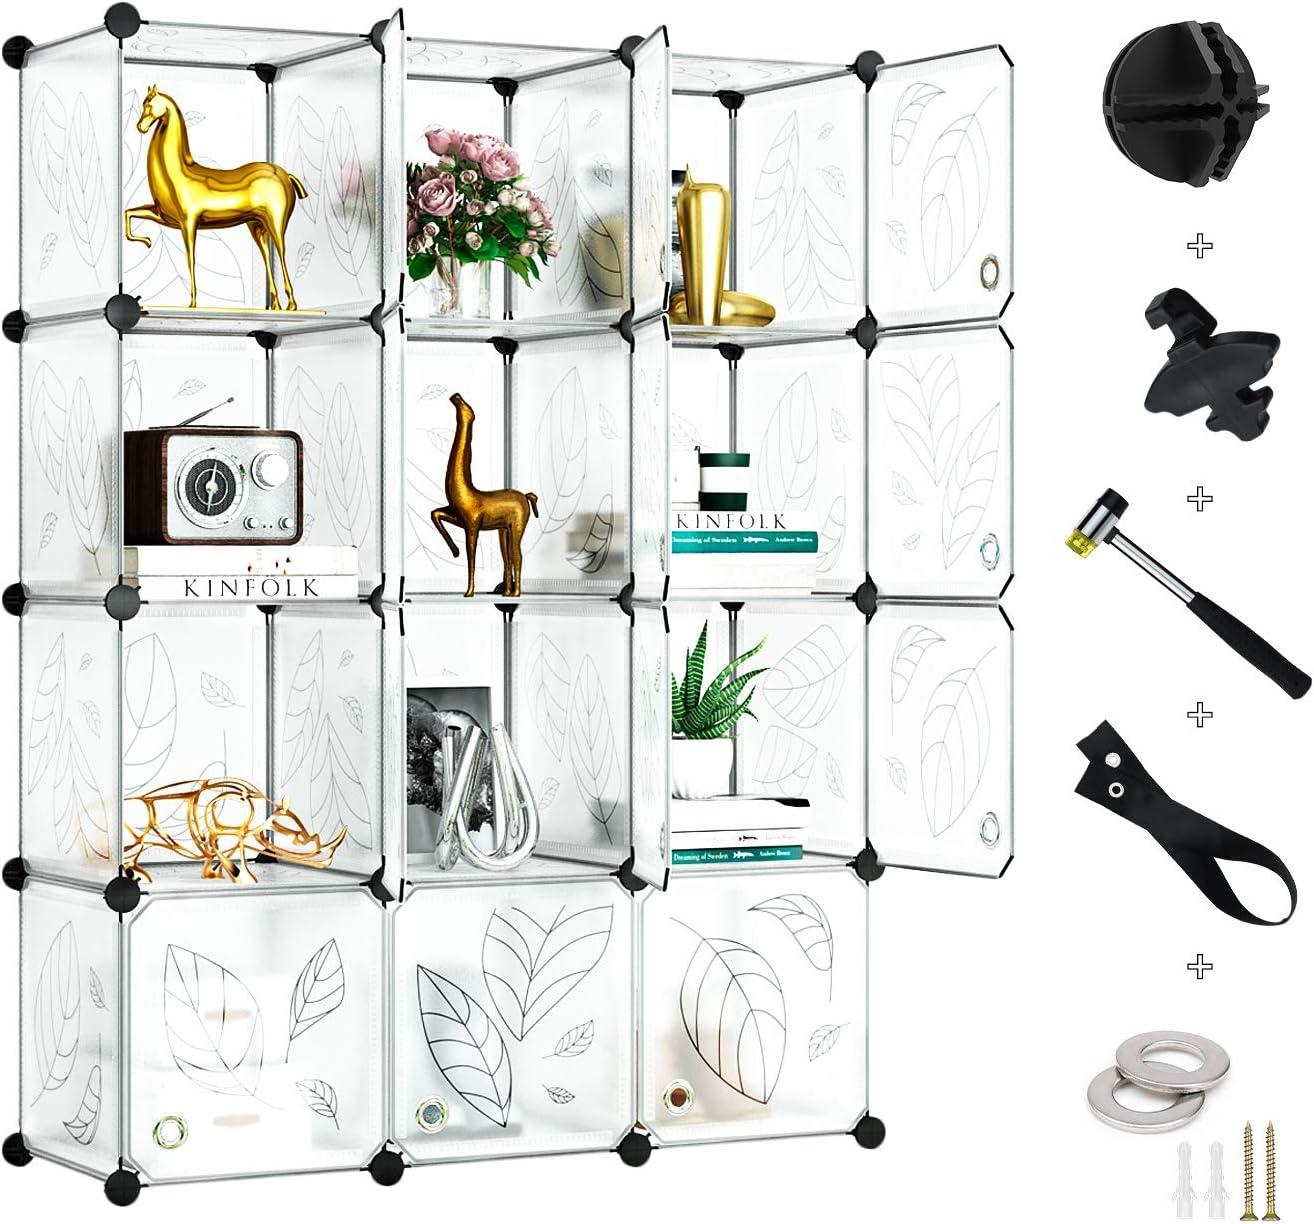 Greenstell Cube Storage Organizer, Plastic Closet Organizer with Doors, 12-Cube DIY Storage Cubes Organizer, Modular Storage Cabinet Book Shelf Shelving for Bedroom, Living Room, Office White